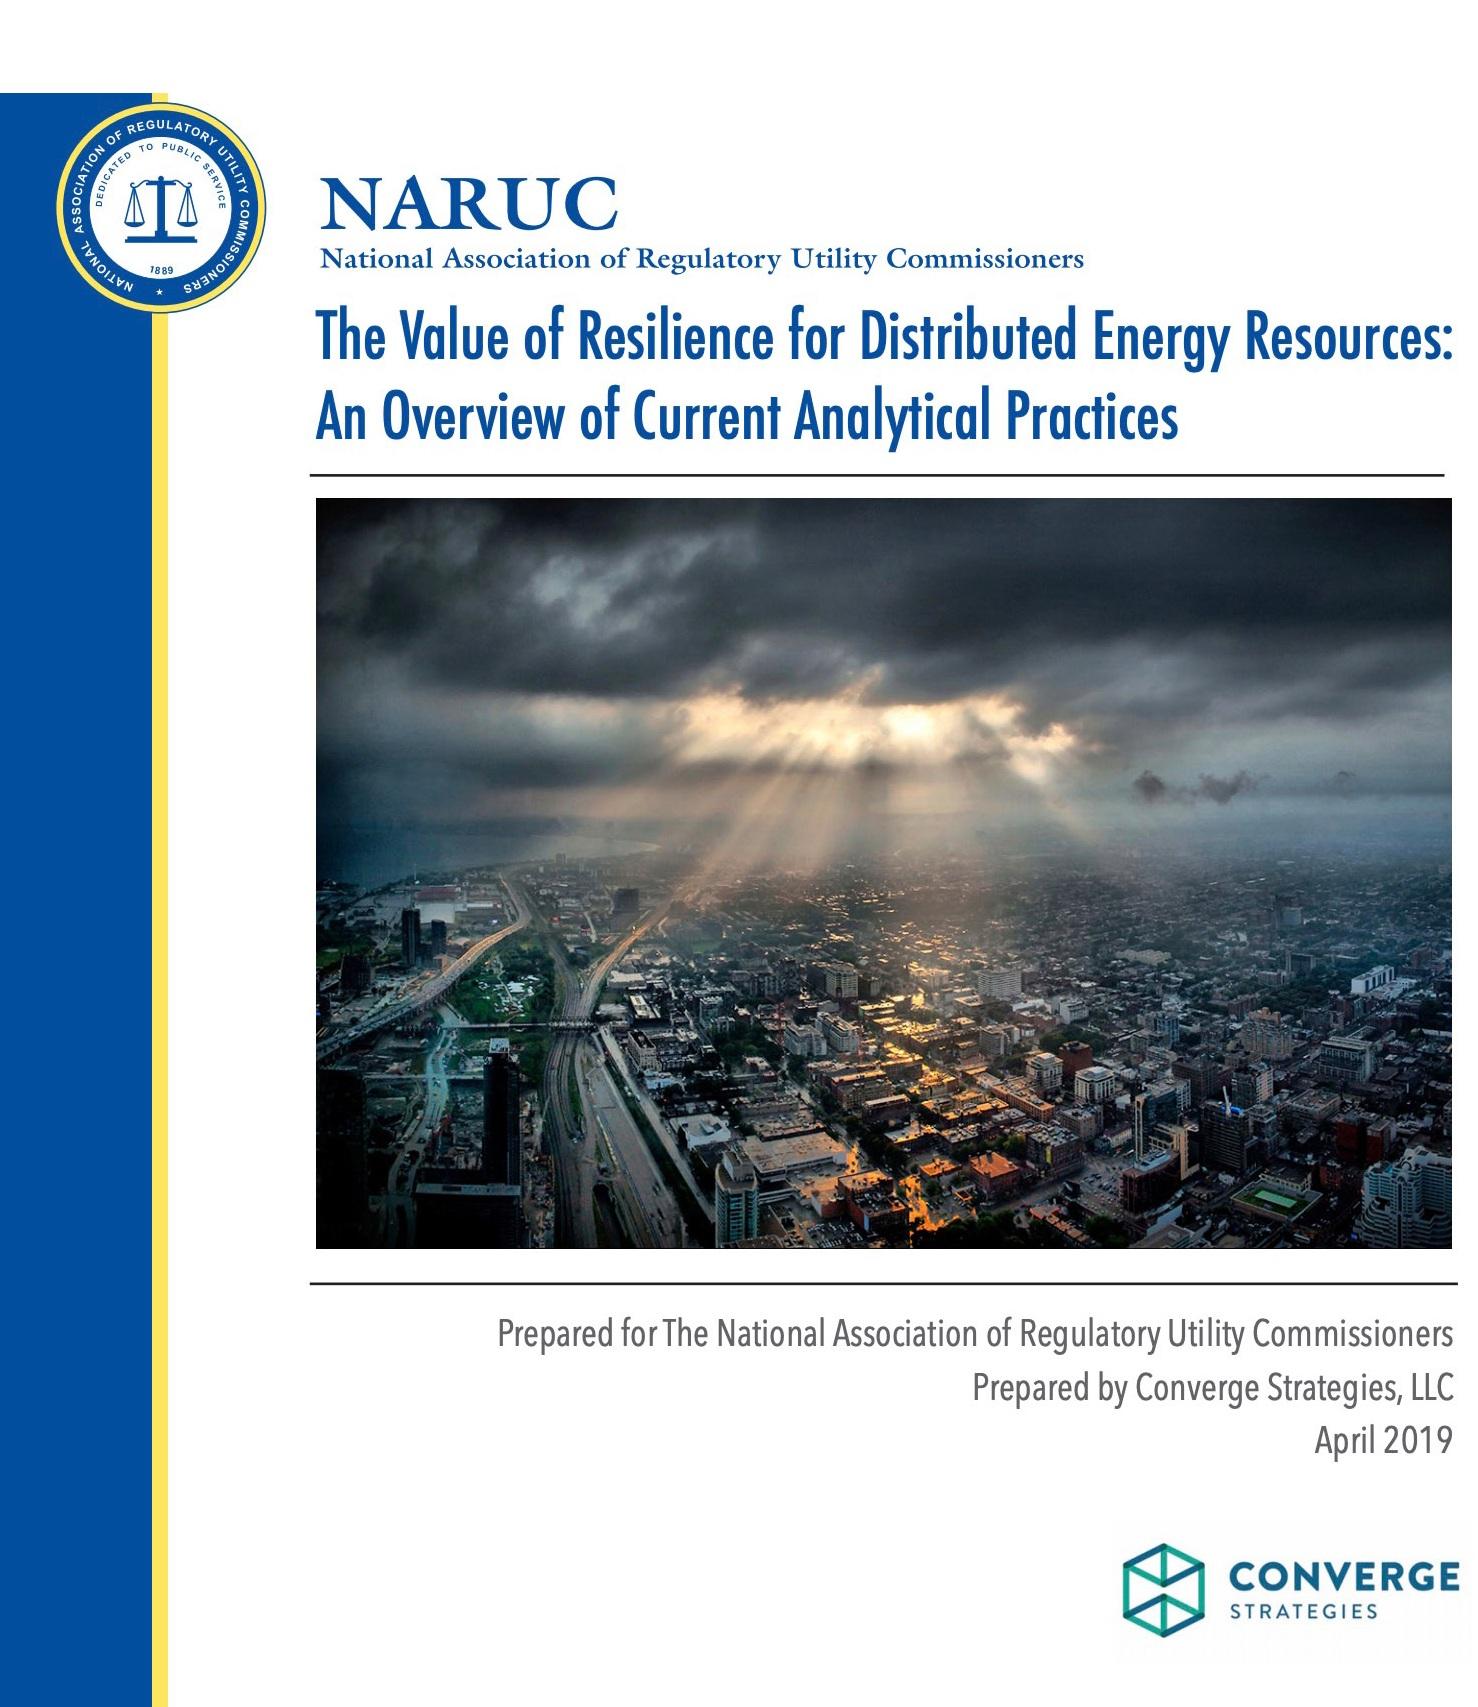 NARUC+VoR+report+cover2.jpg